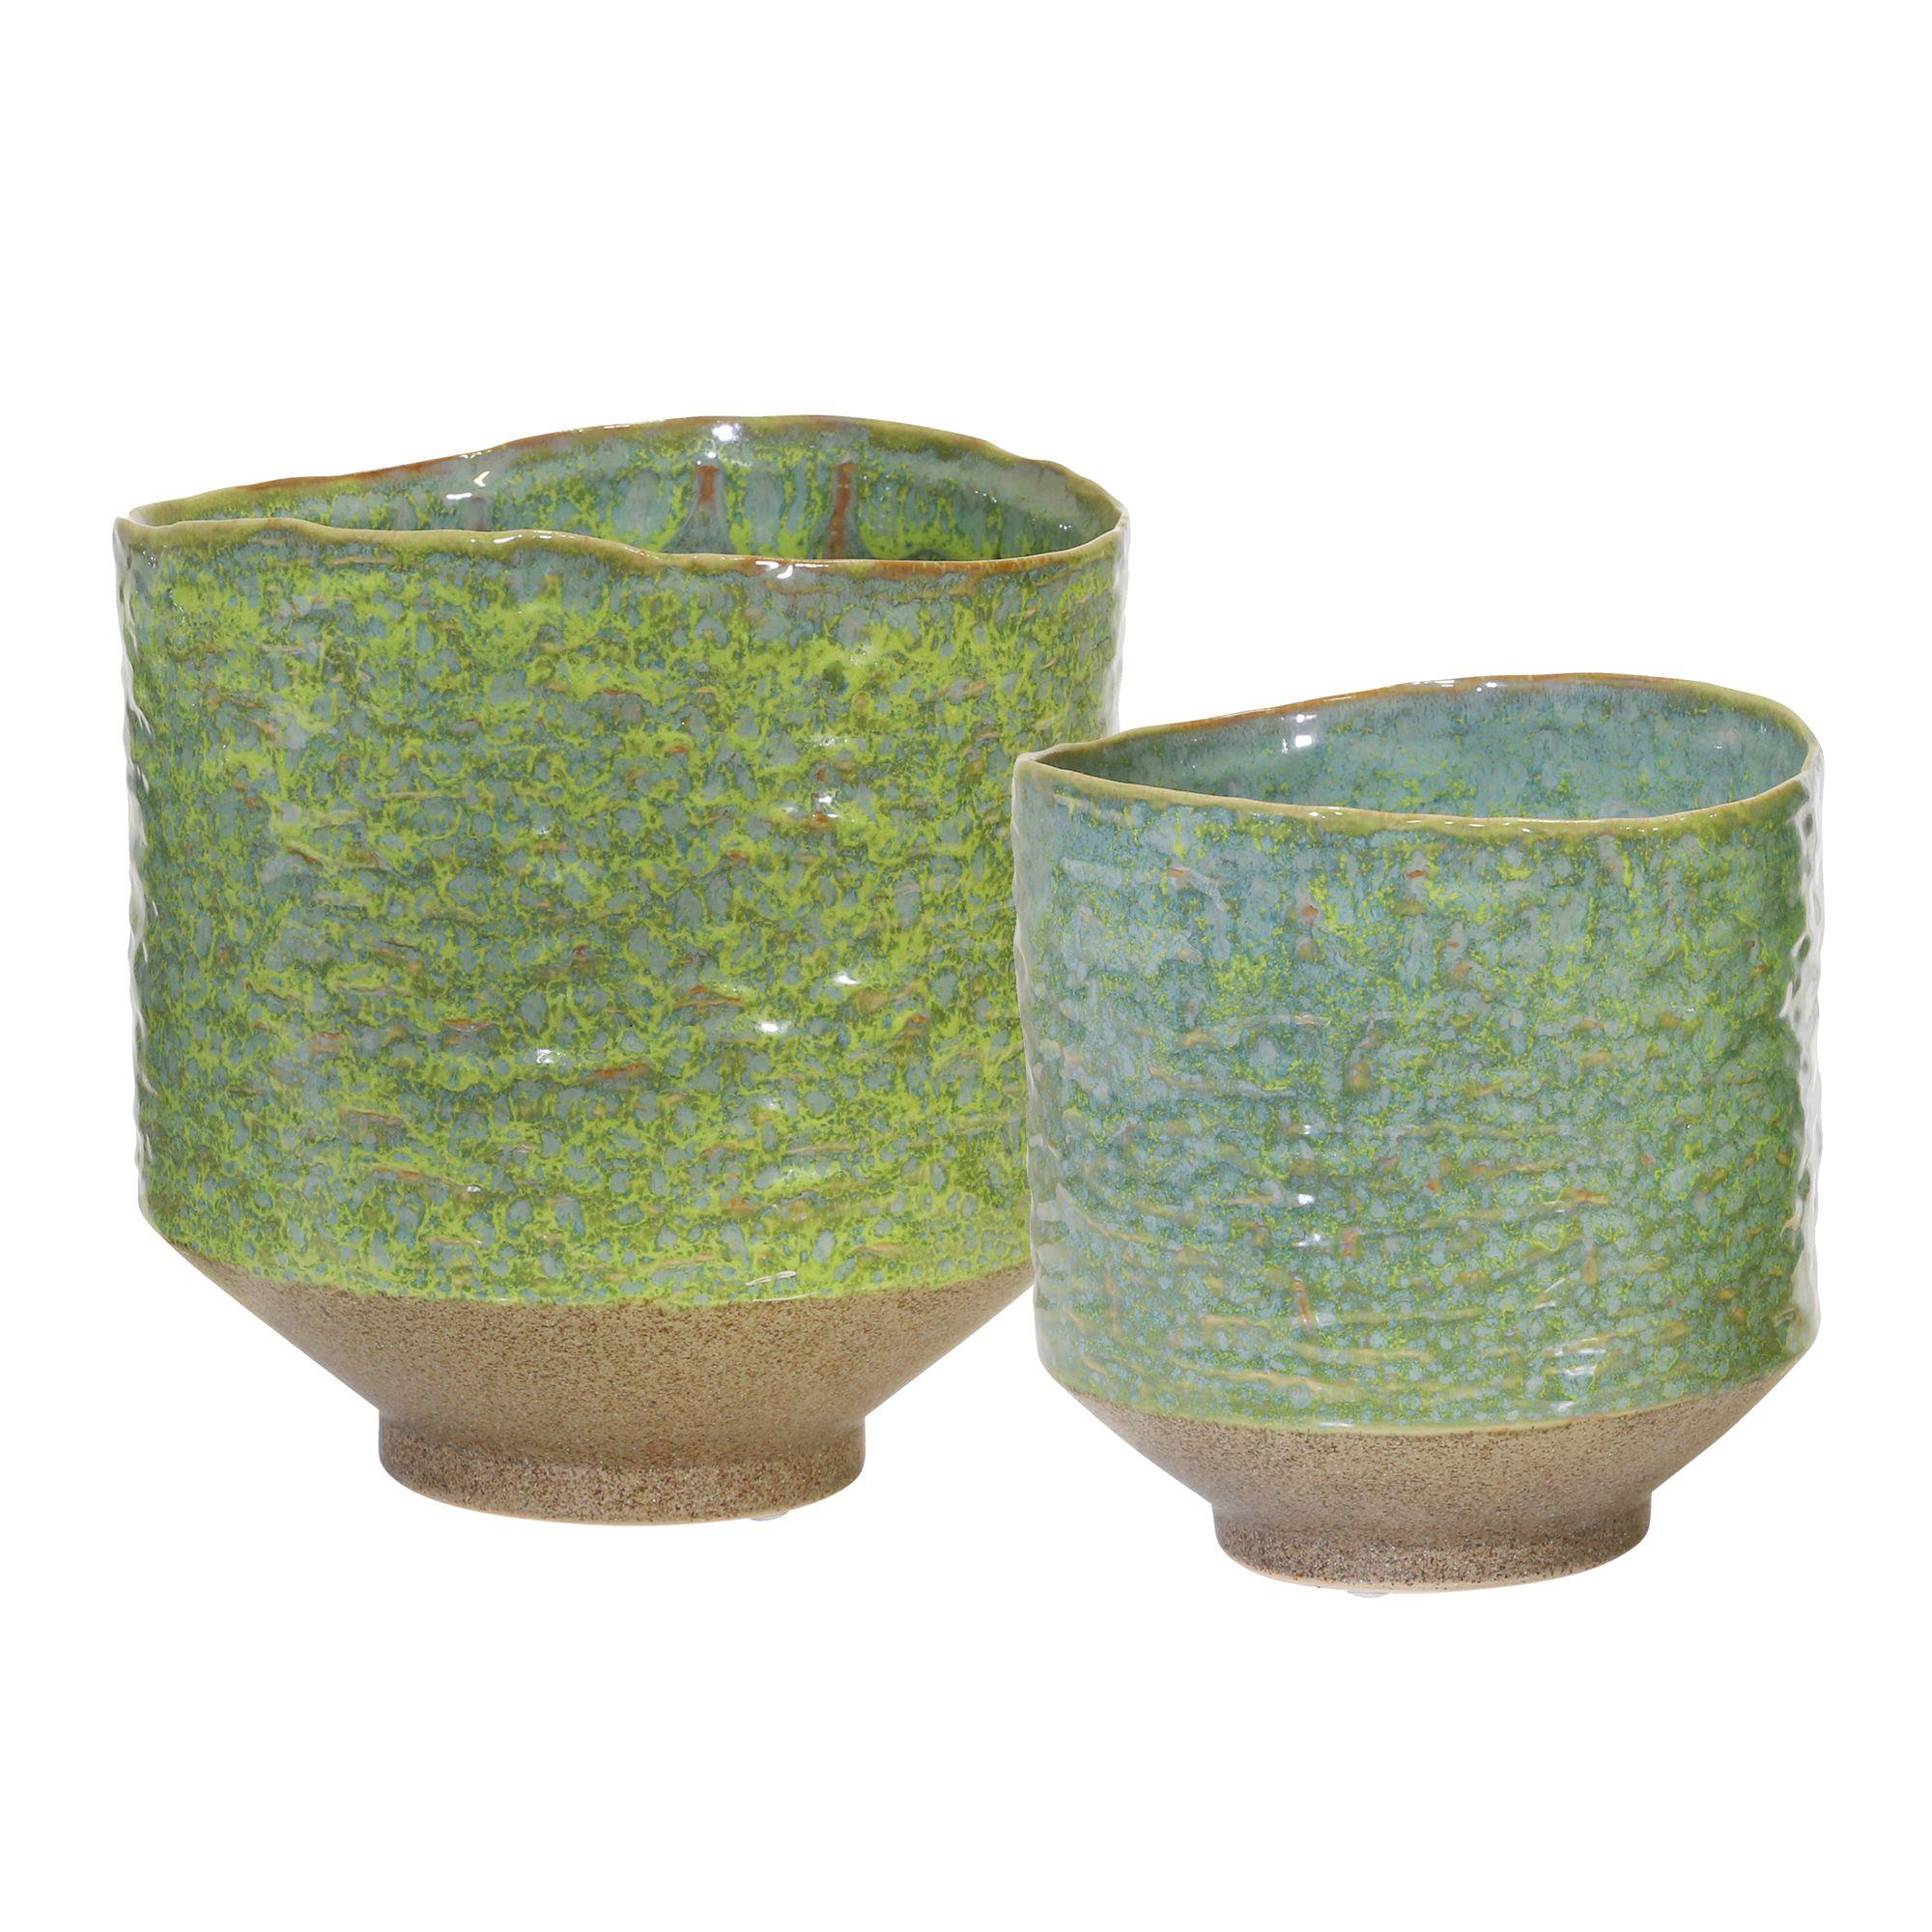 Ceramic Planters 8 6 5 Sage Green Set Of 2 Sagebrook Home 13957 02 Ceramic Planters Ceramics Planters